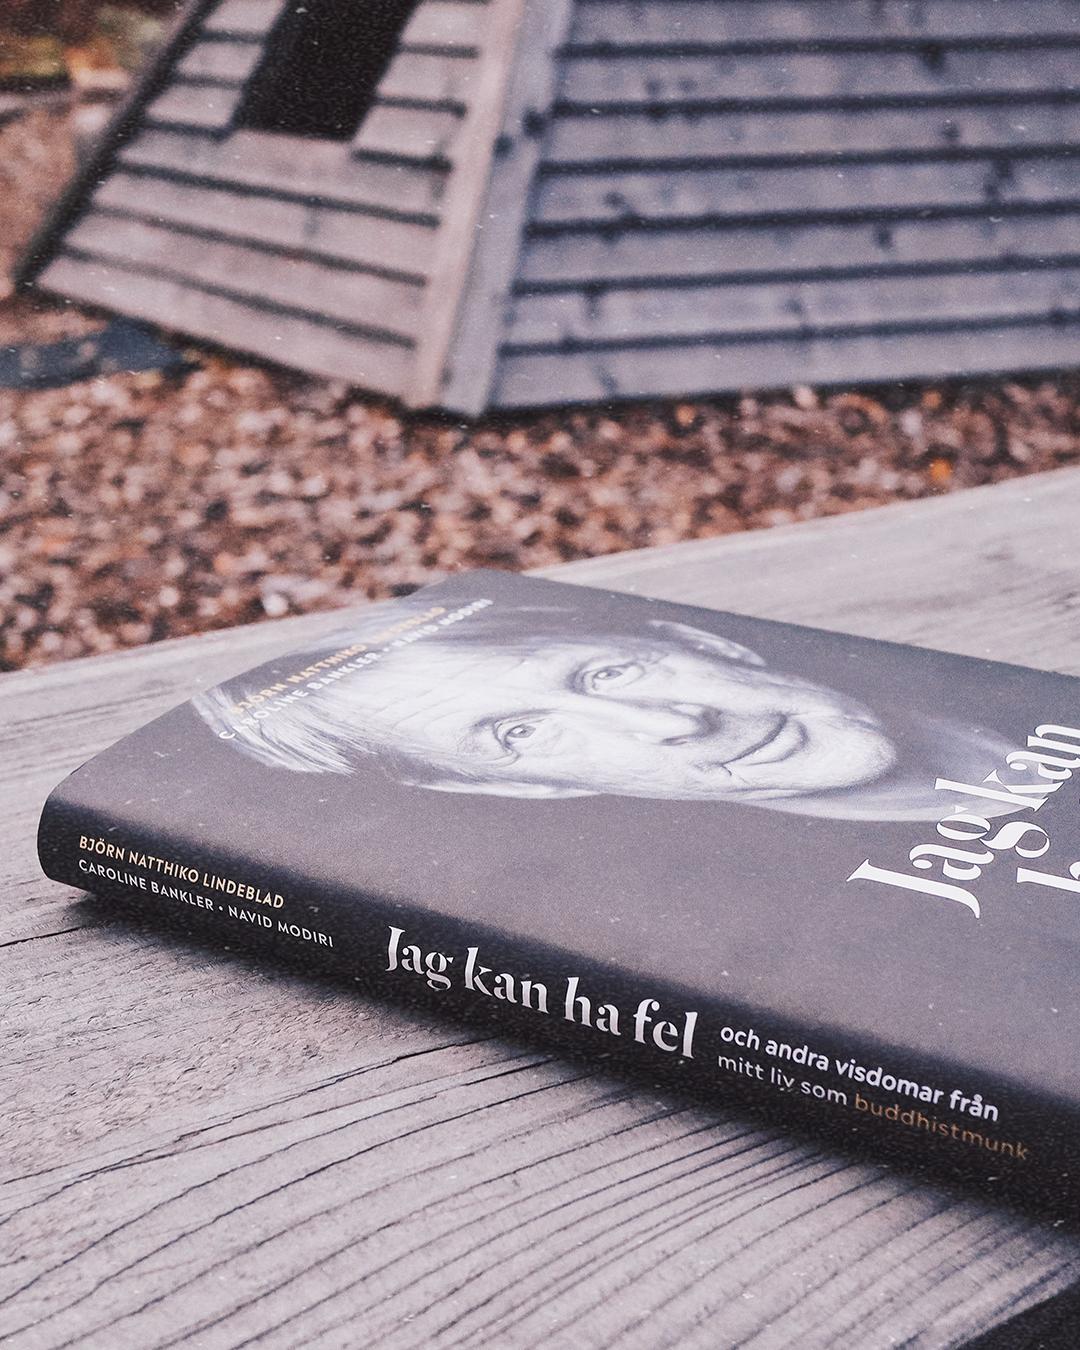 Bokrecension: Jag kan ha fel – Björn Natthiko Lindeblad